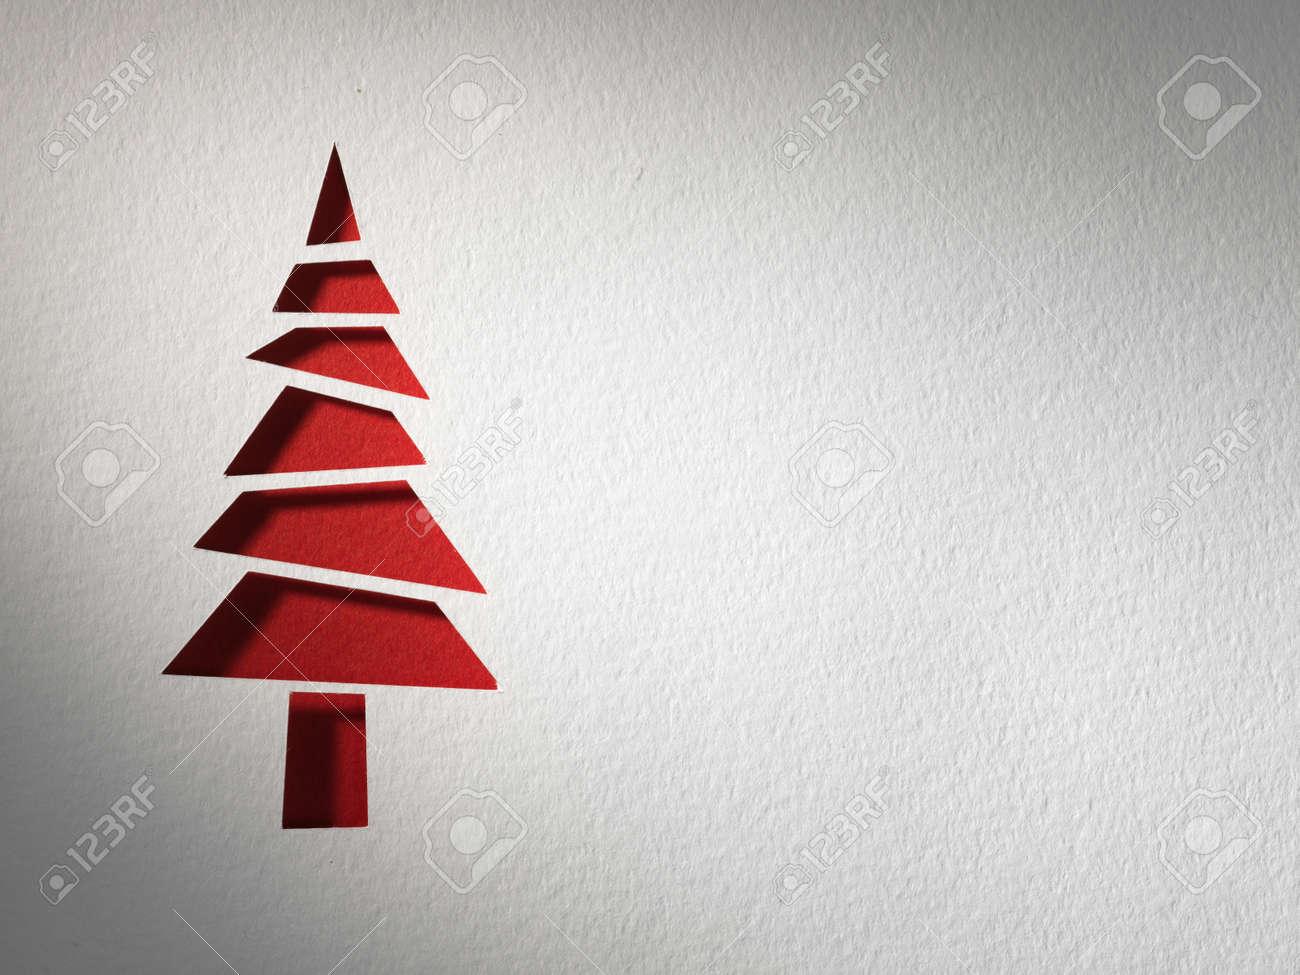 Cristmas tree paper cutting design card. Stock Photo - 17461367